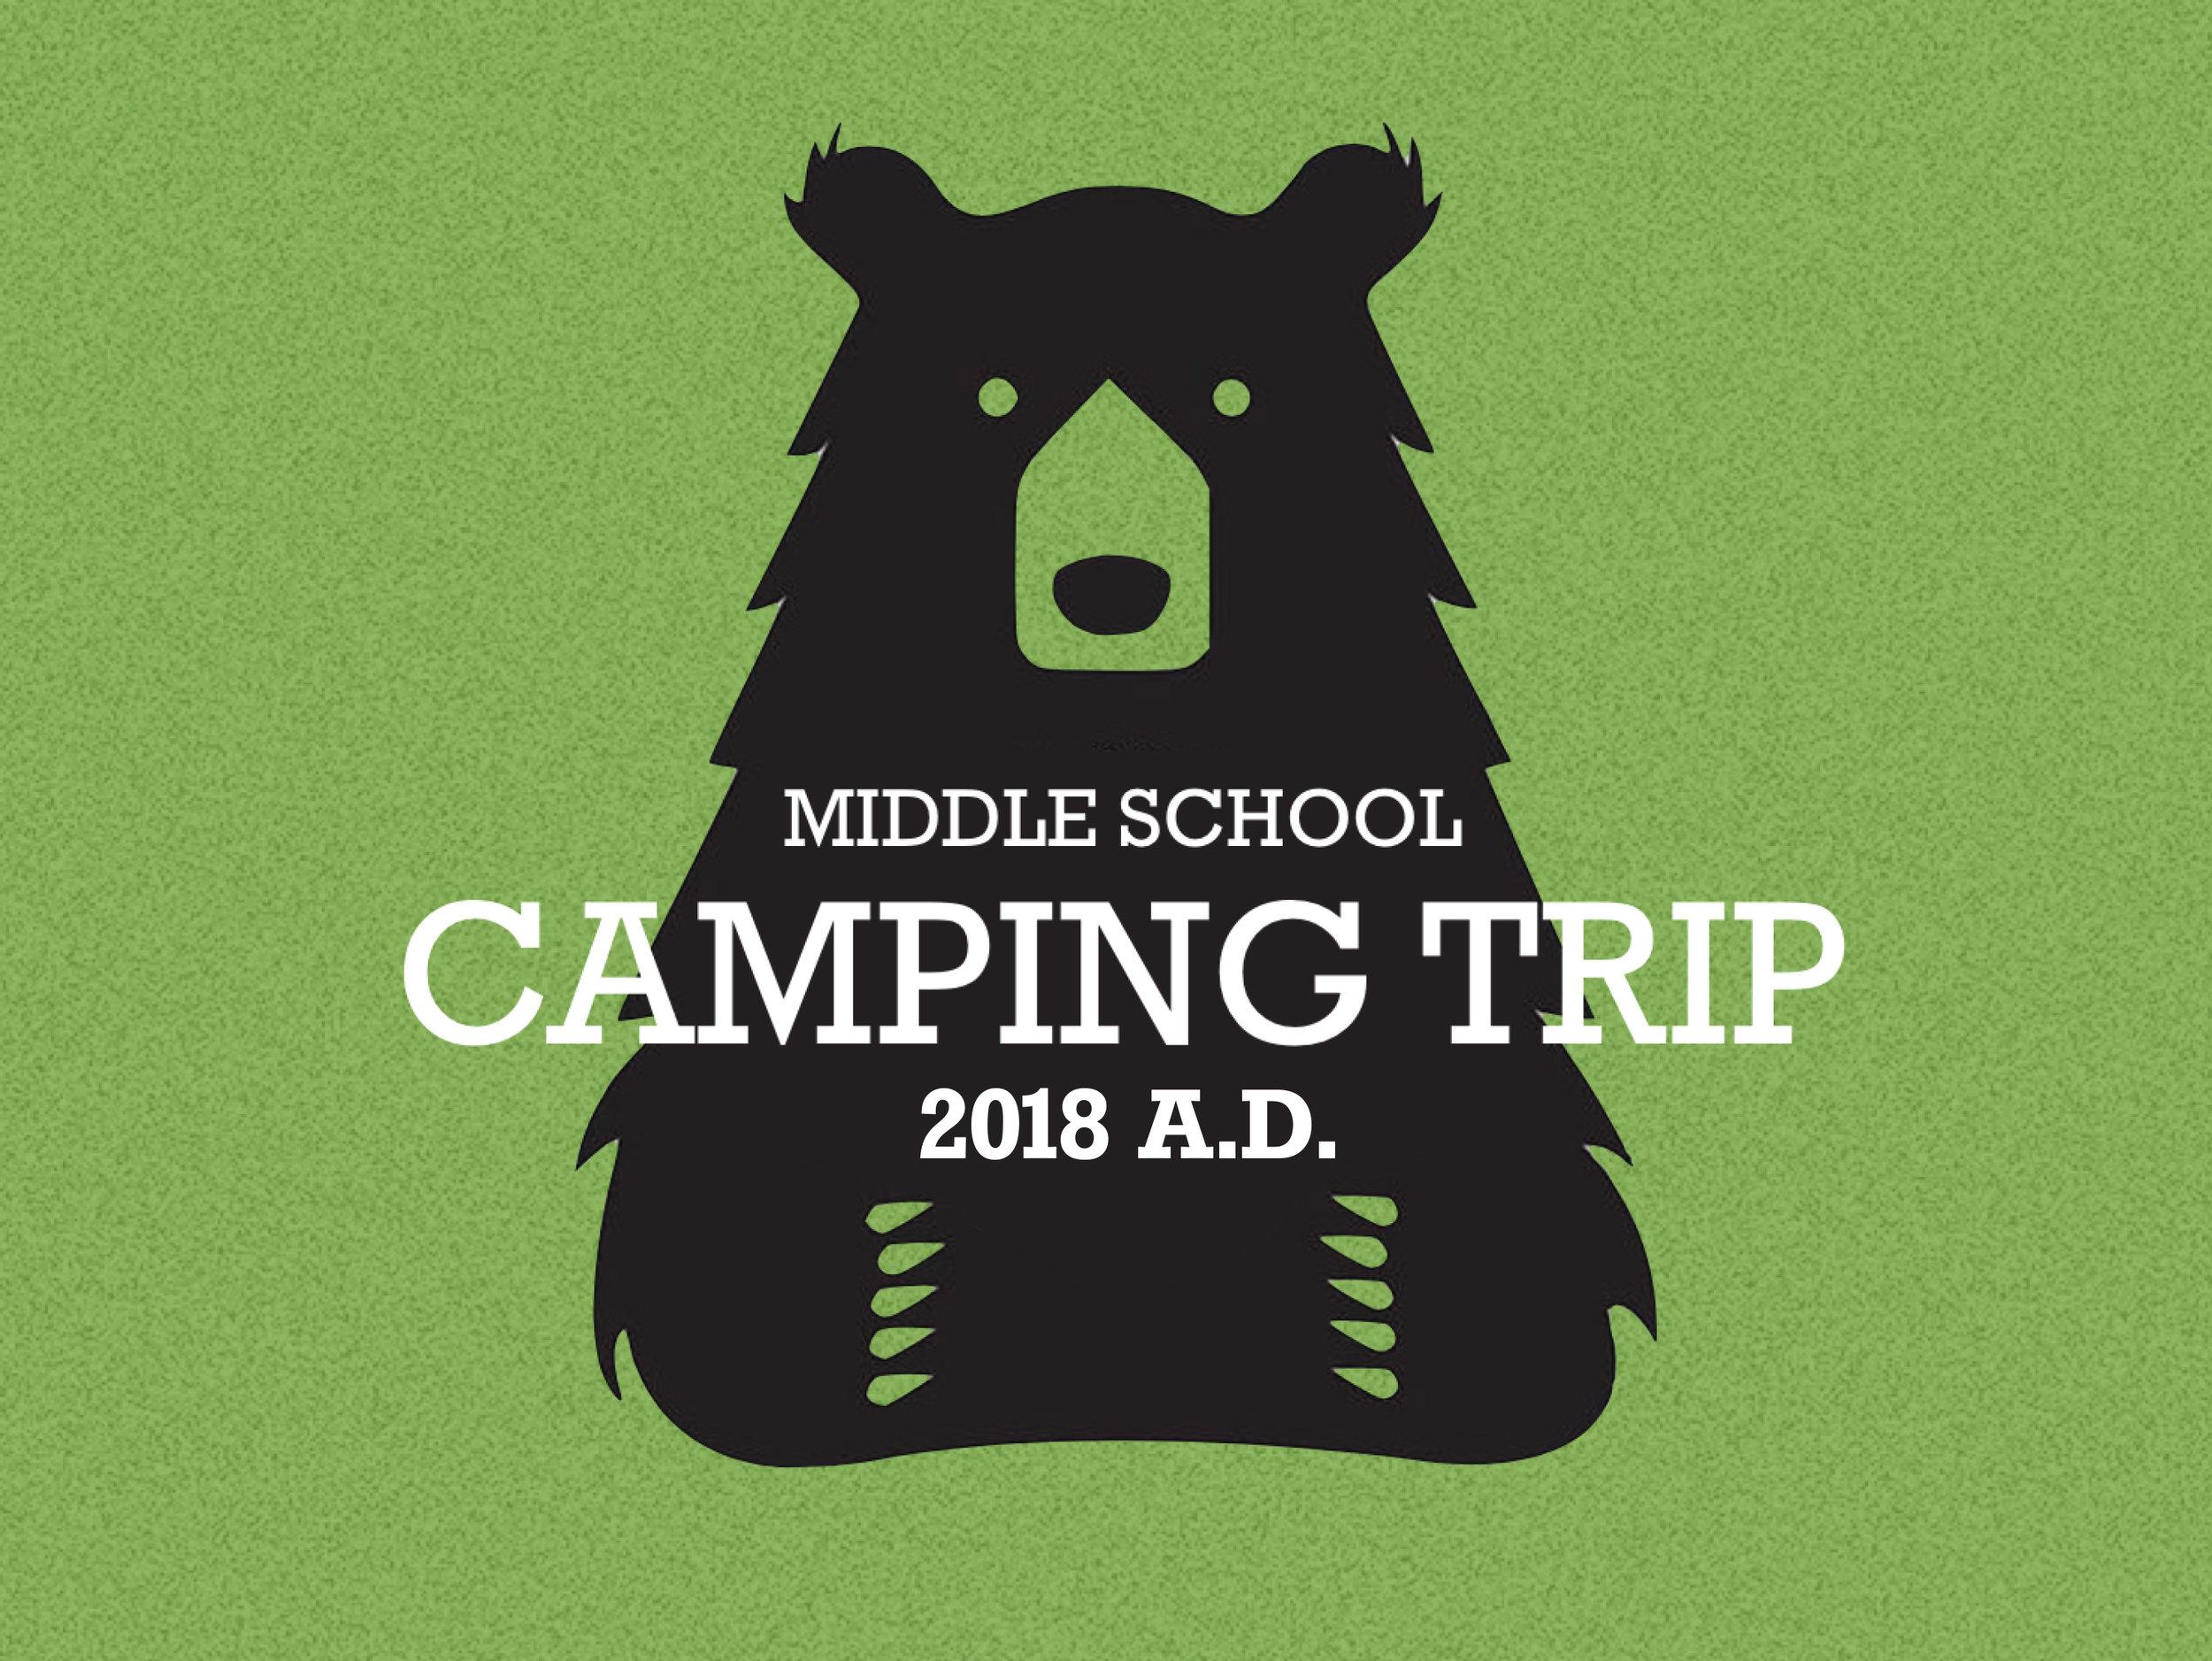 MS Camping Trip 2018.jpg